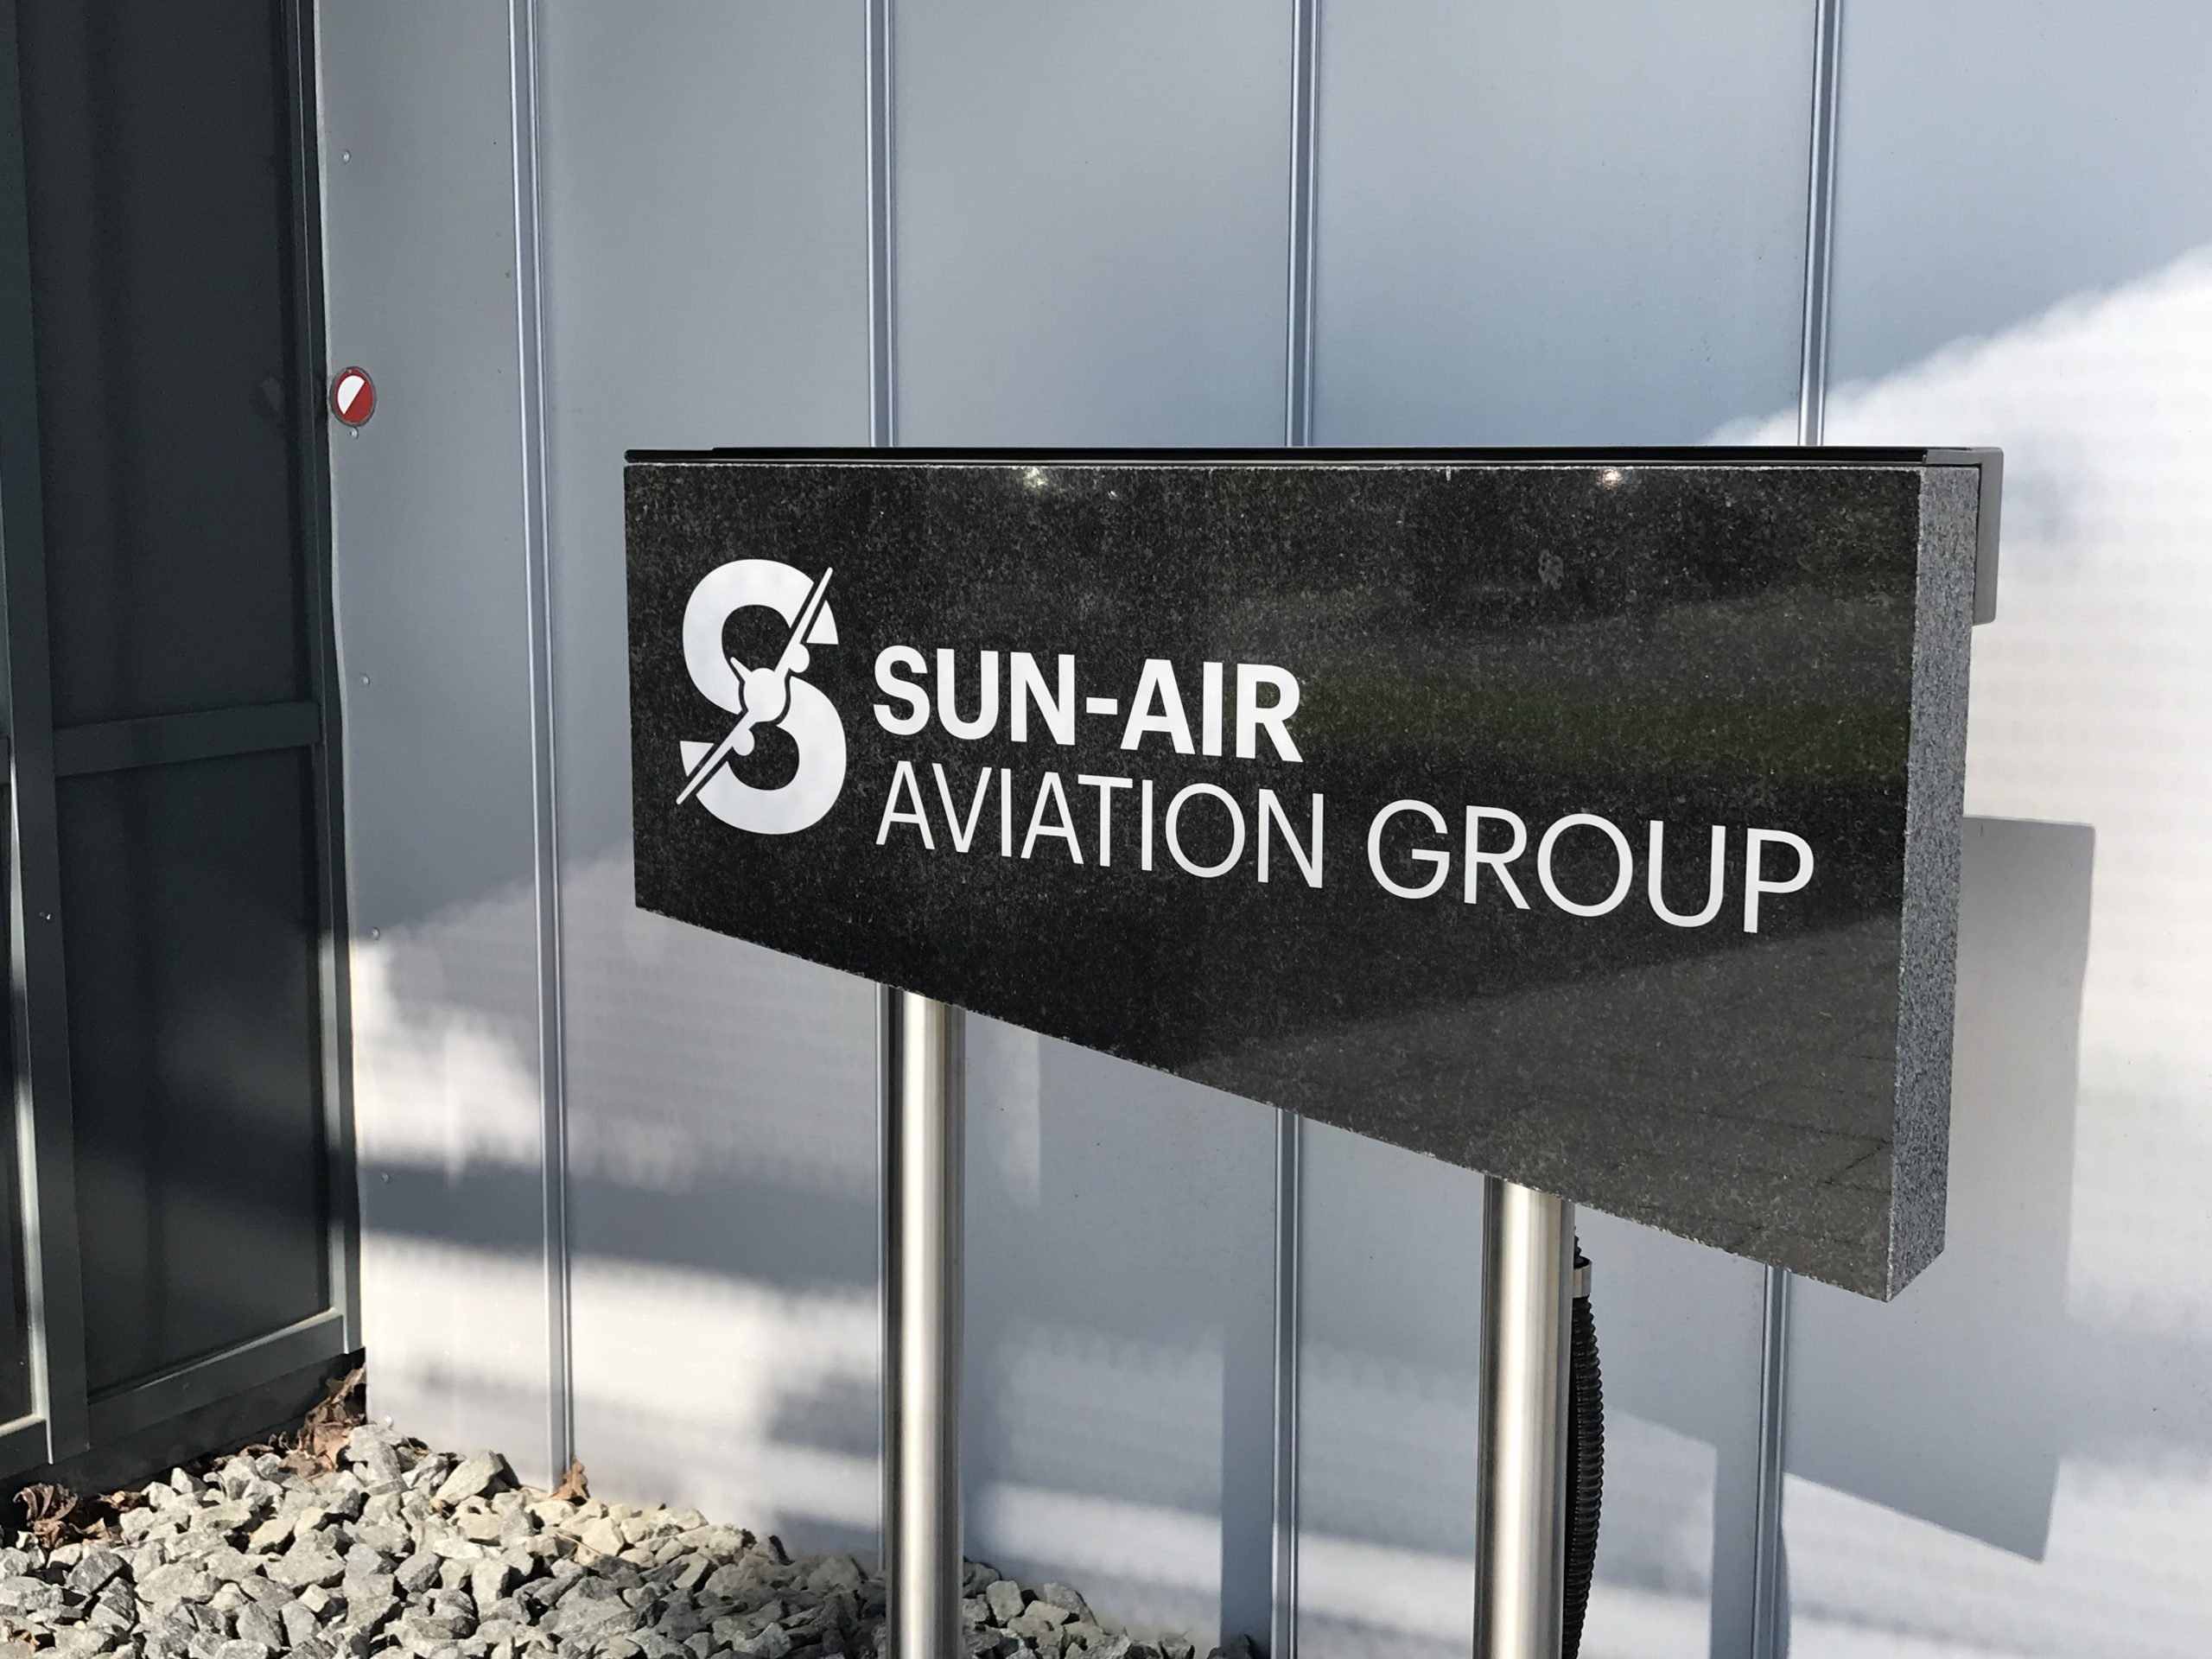 SUN-AIR har hovedkontor i Billund. (Foto: Ole Kirchert Christensen)